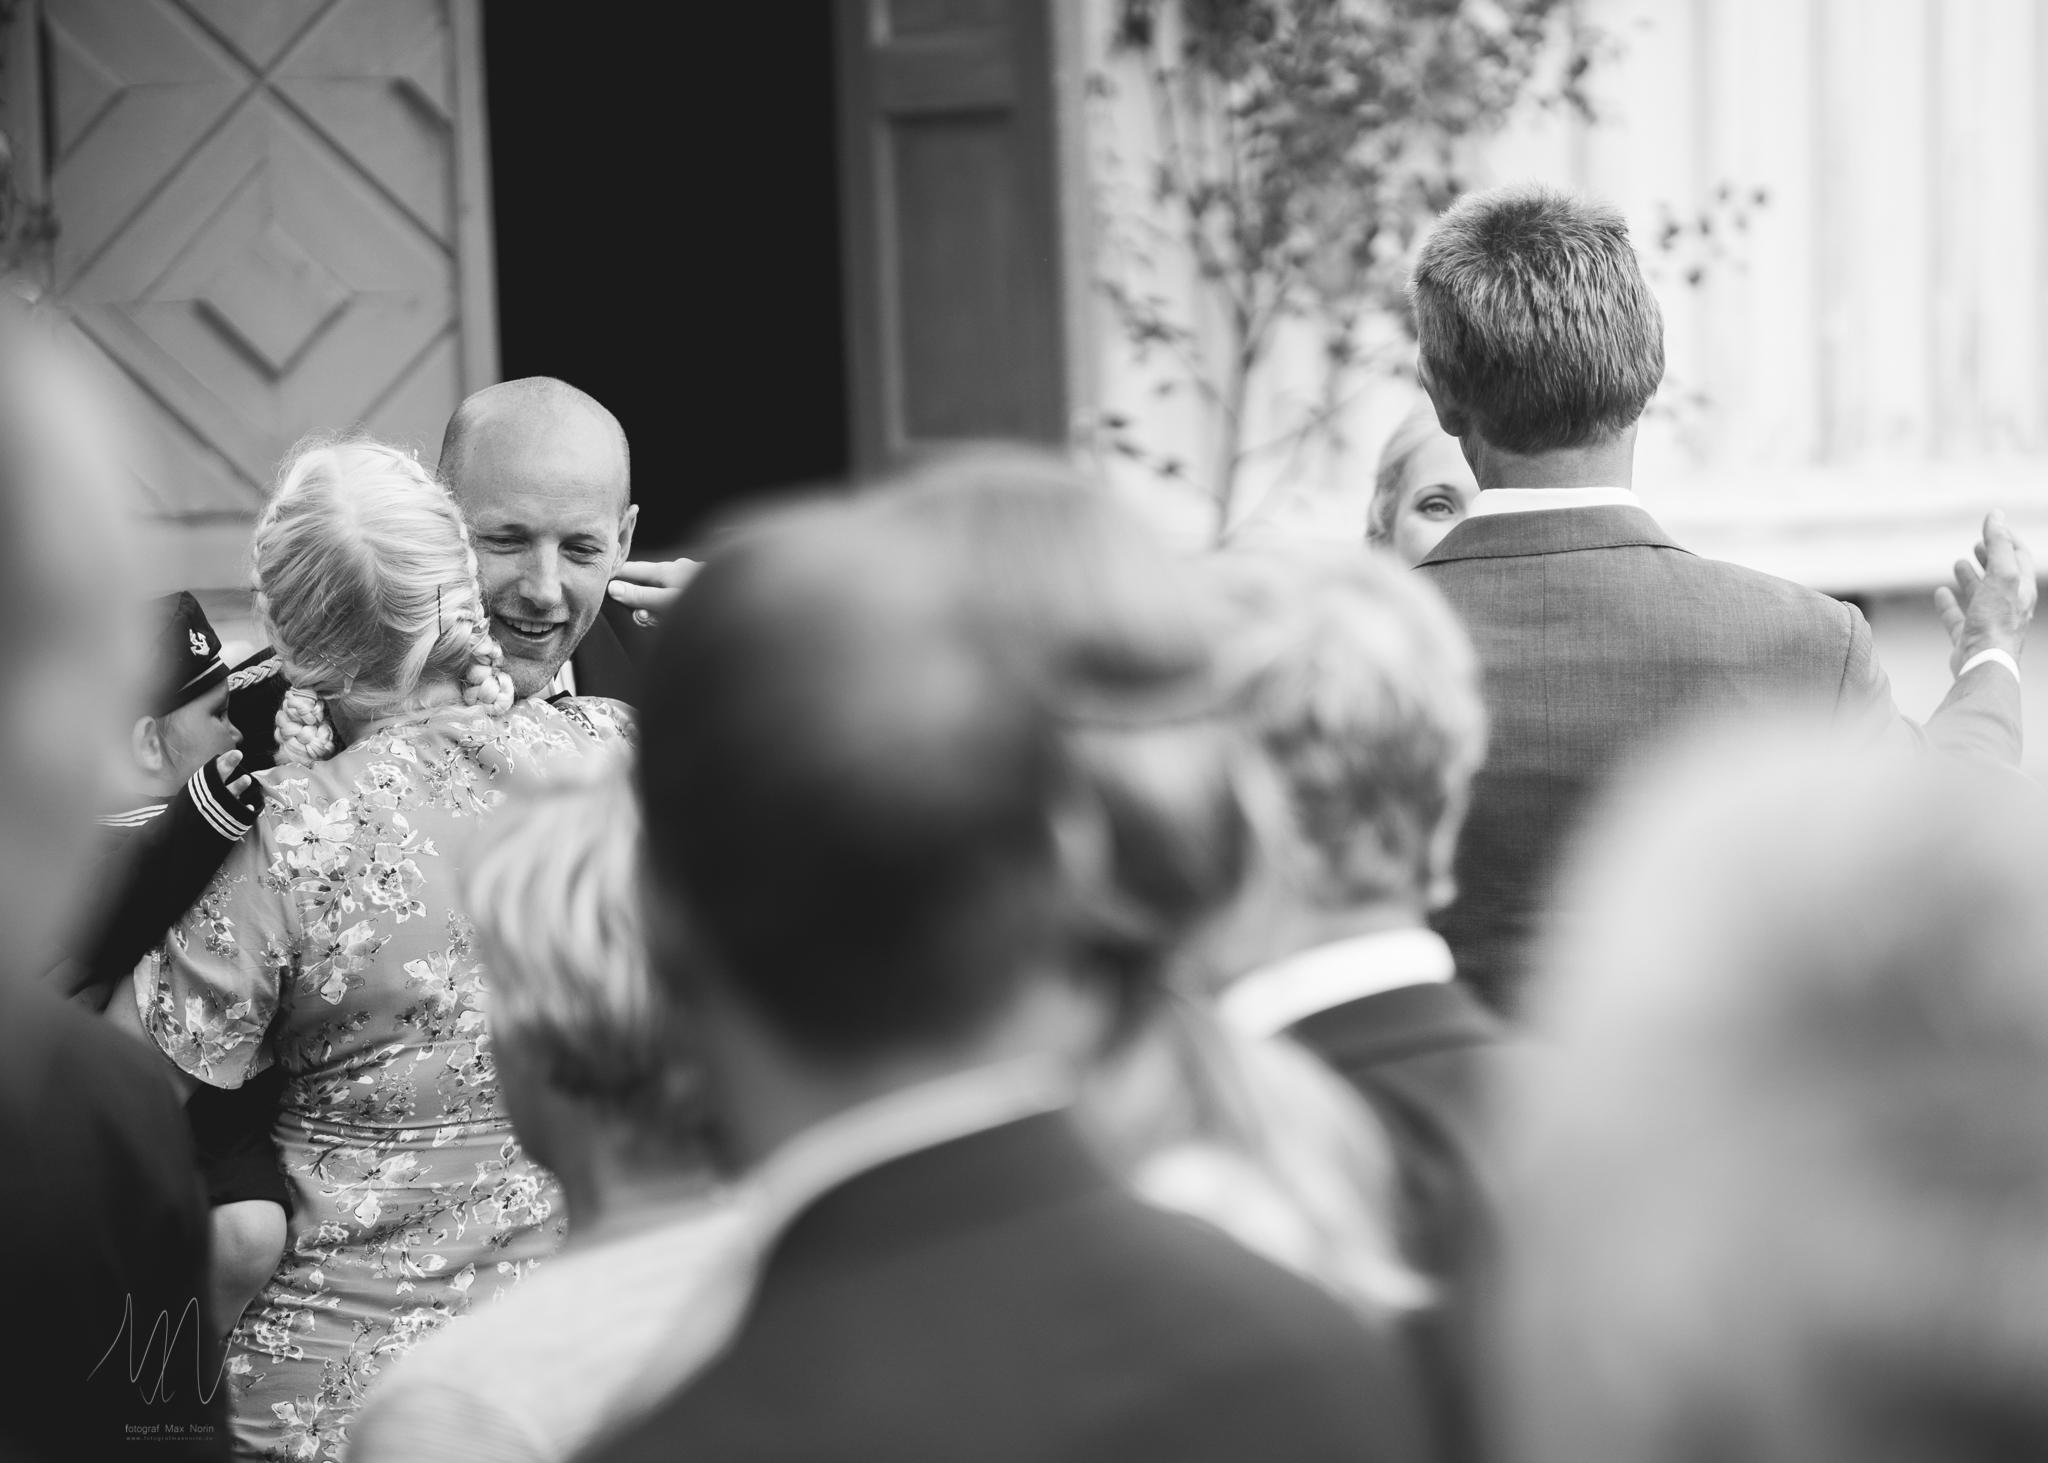 Bröllop-fotografmaxnorin.se-MariaMarcus-181.JPG